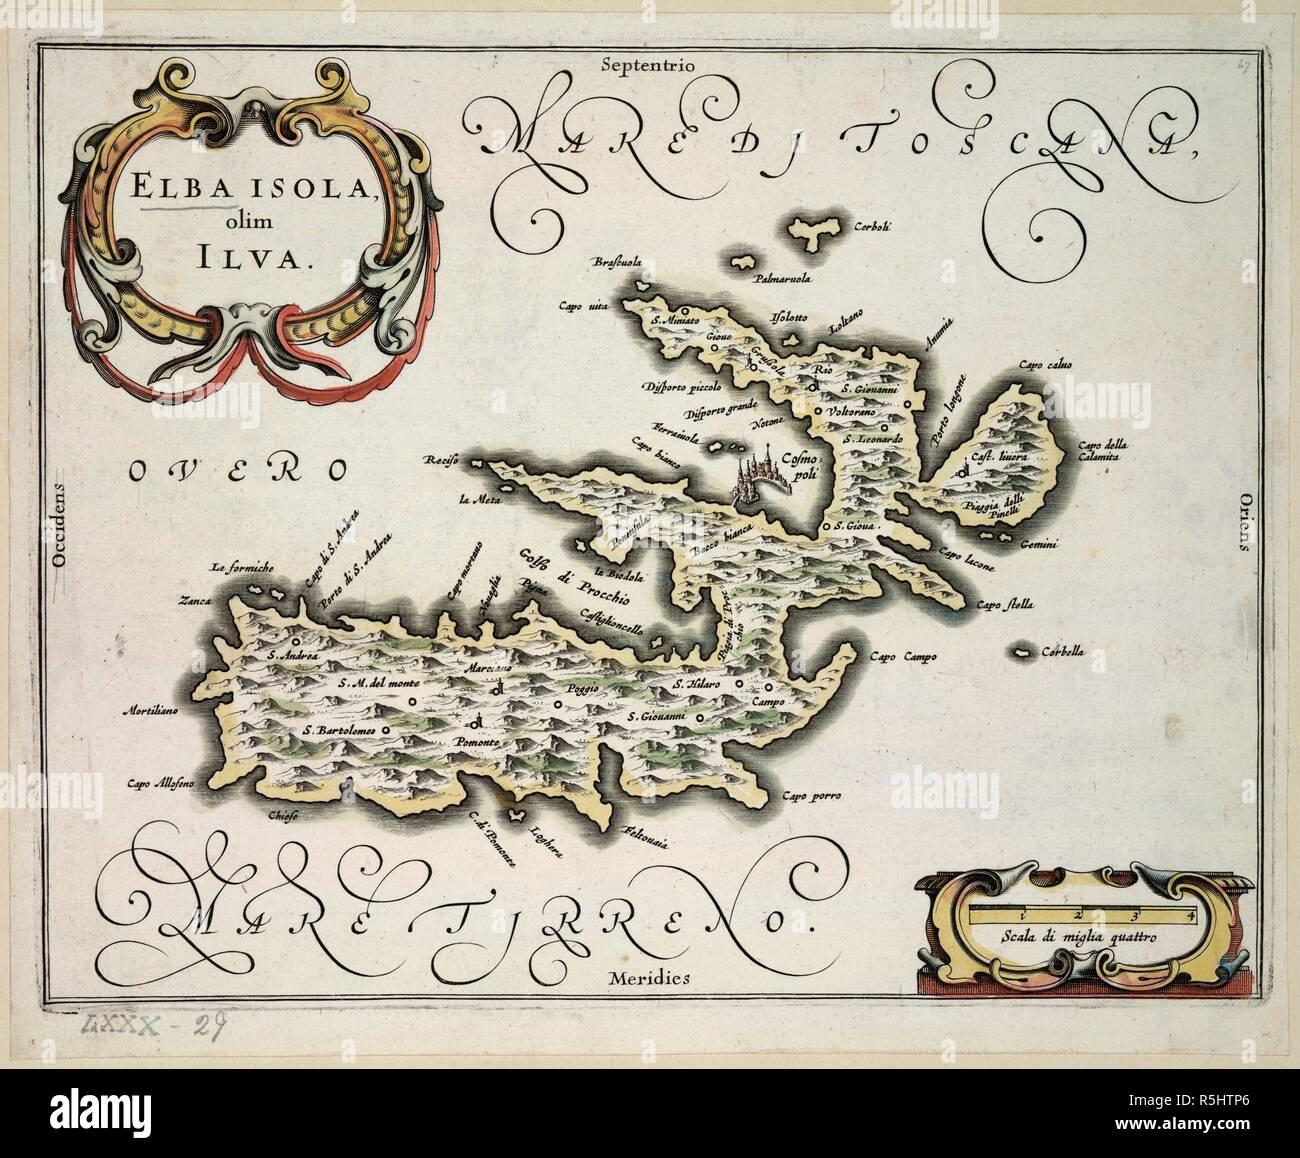 Insel Elba Karte.Die Insel Elba Elba Isola Olim Ilva Karte Der Insel Elba Bild